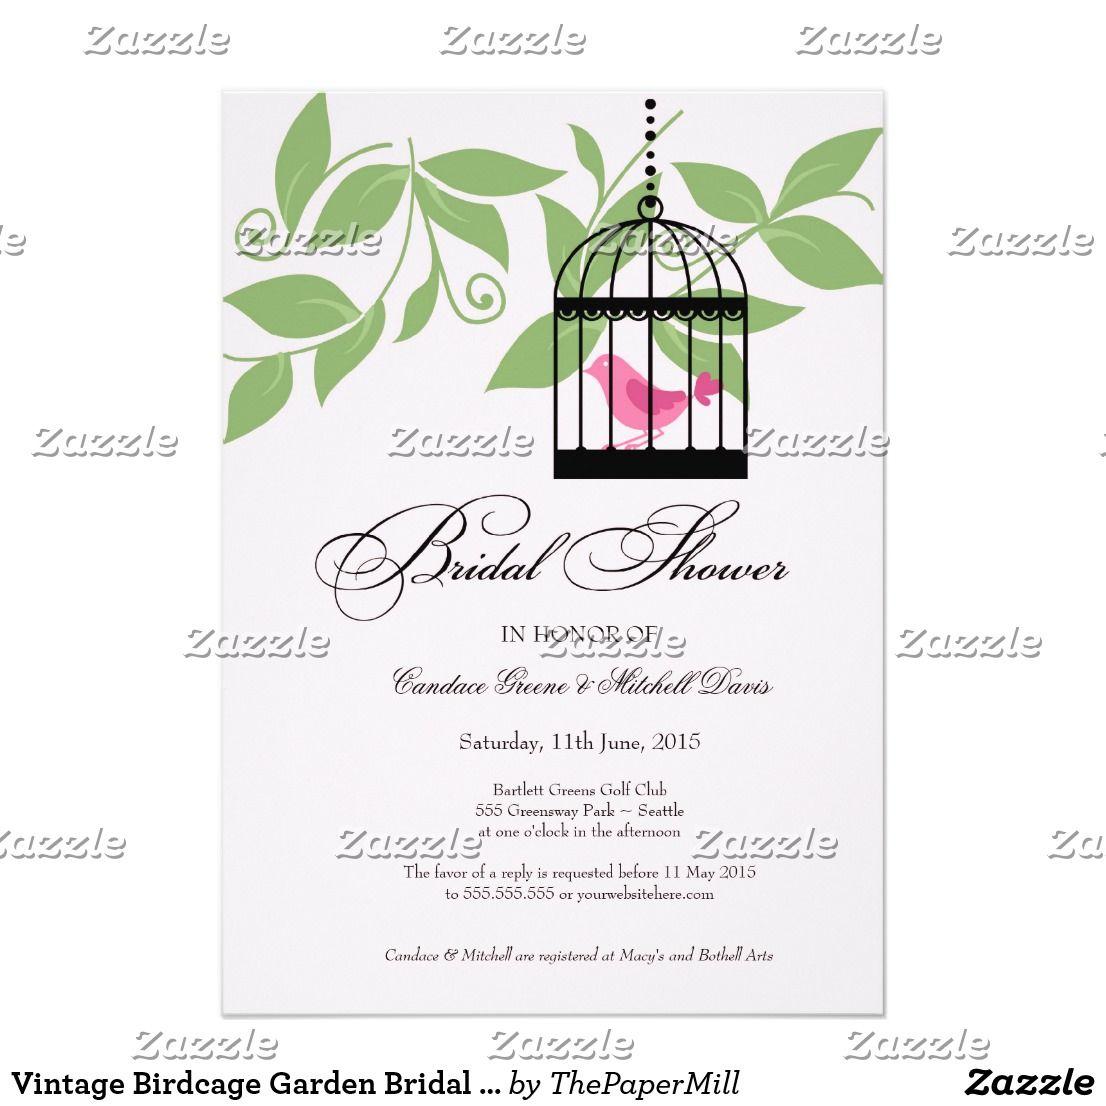 Vintage Birdcage Garden Bridal Shower Invitations | Garden bridal ...